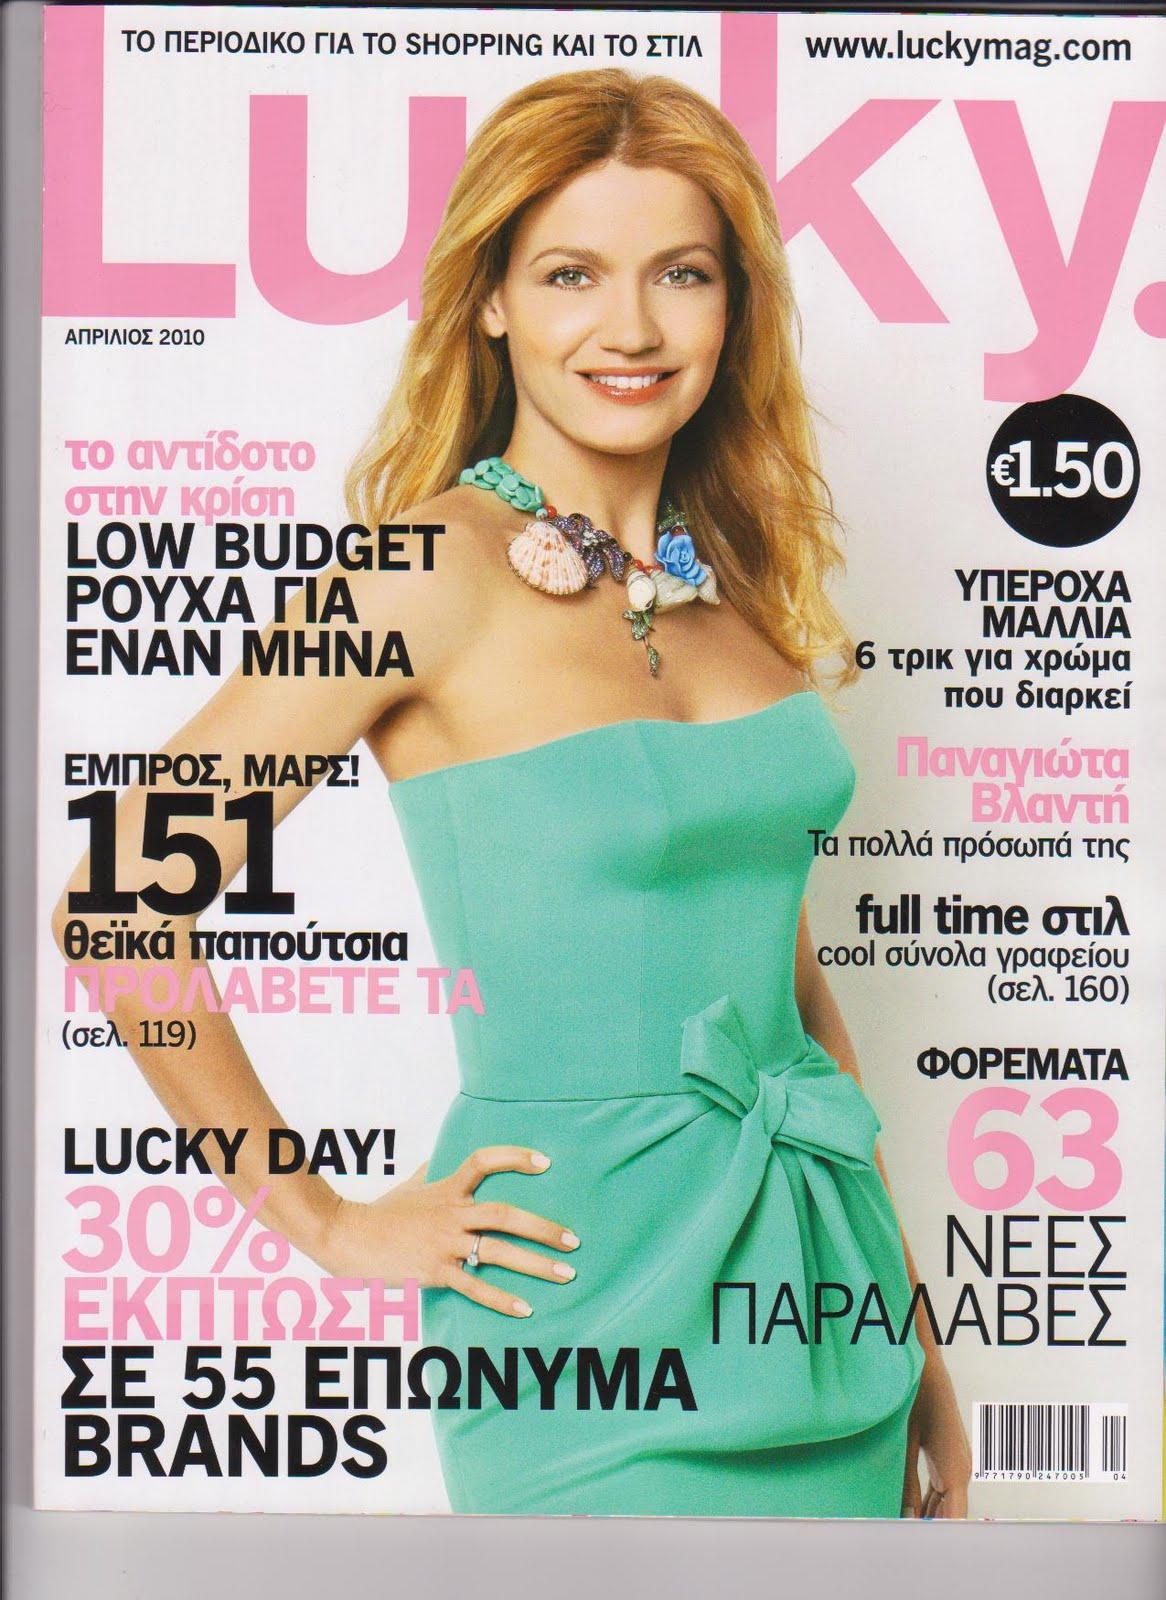 Lucky Magazine May 11: DRESS AFFAIR: Editorial: LUCKY Magazine April